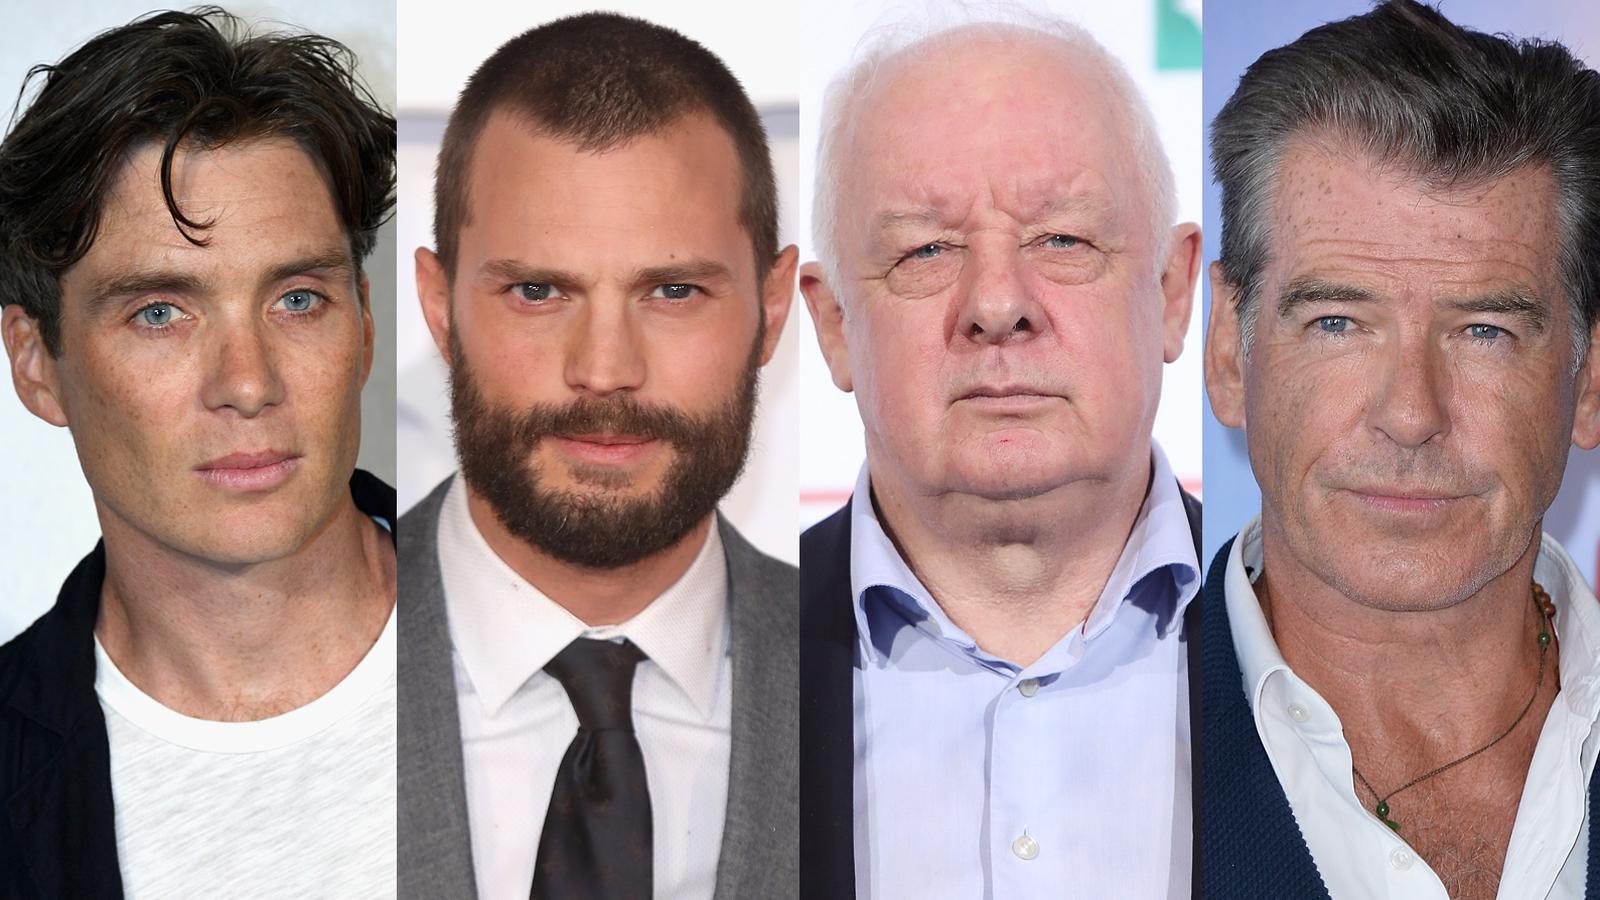 Cillian Murphy, Jamie Dornan, Jim Sheridan and Pierce Brosnan - A superb line-